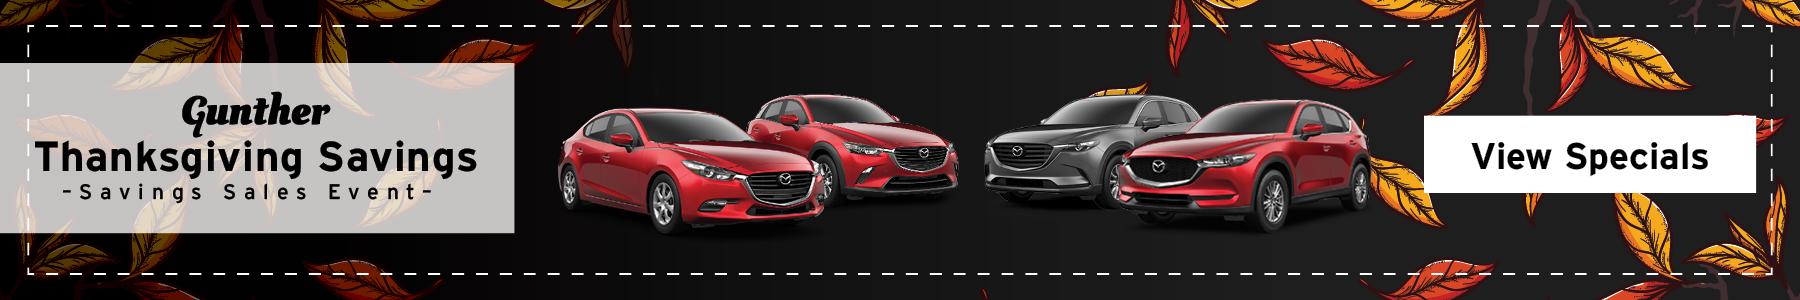 Mazda Fall Event. View Specials.